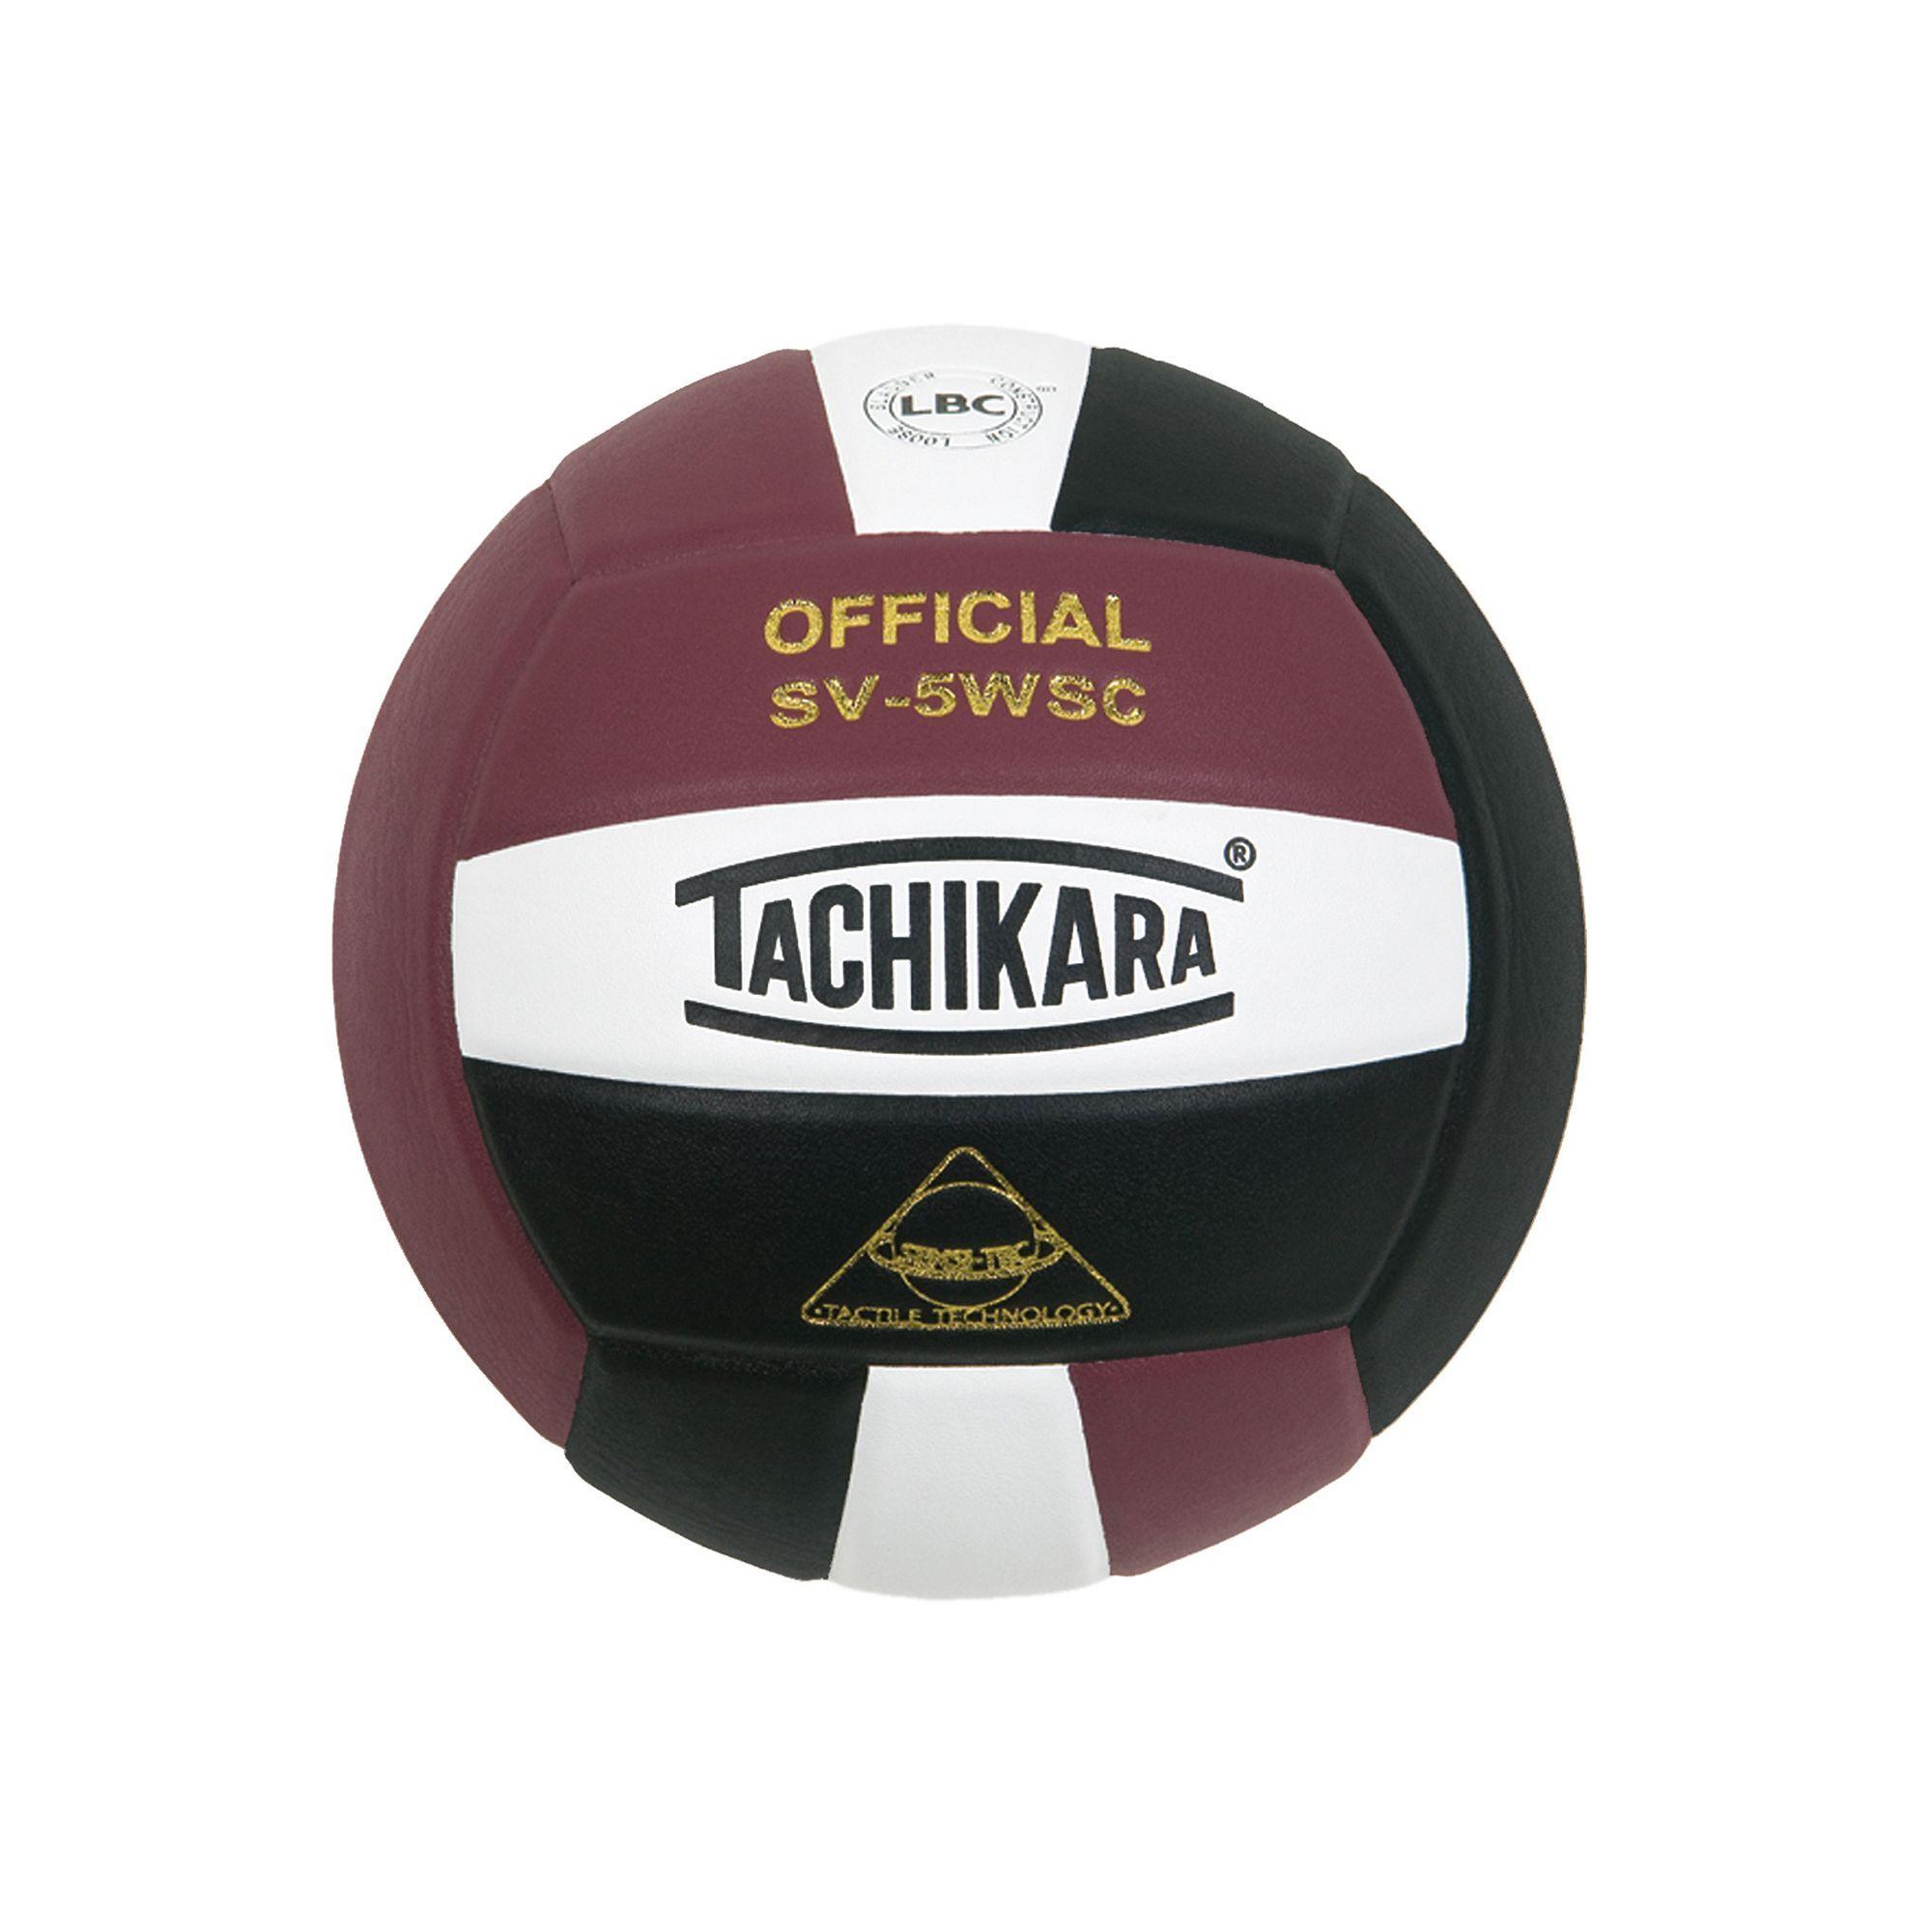 Tachikara Official Sv5wsc Microfiber Composite Leather Volleyball In 2020 Volleyball Leather Tachikara Volleyball